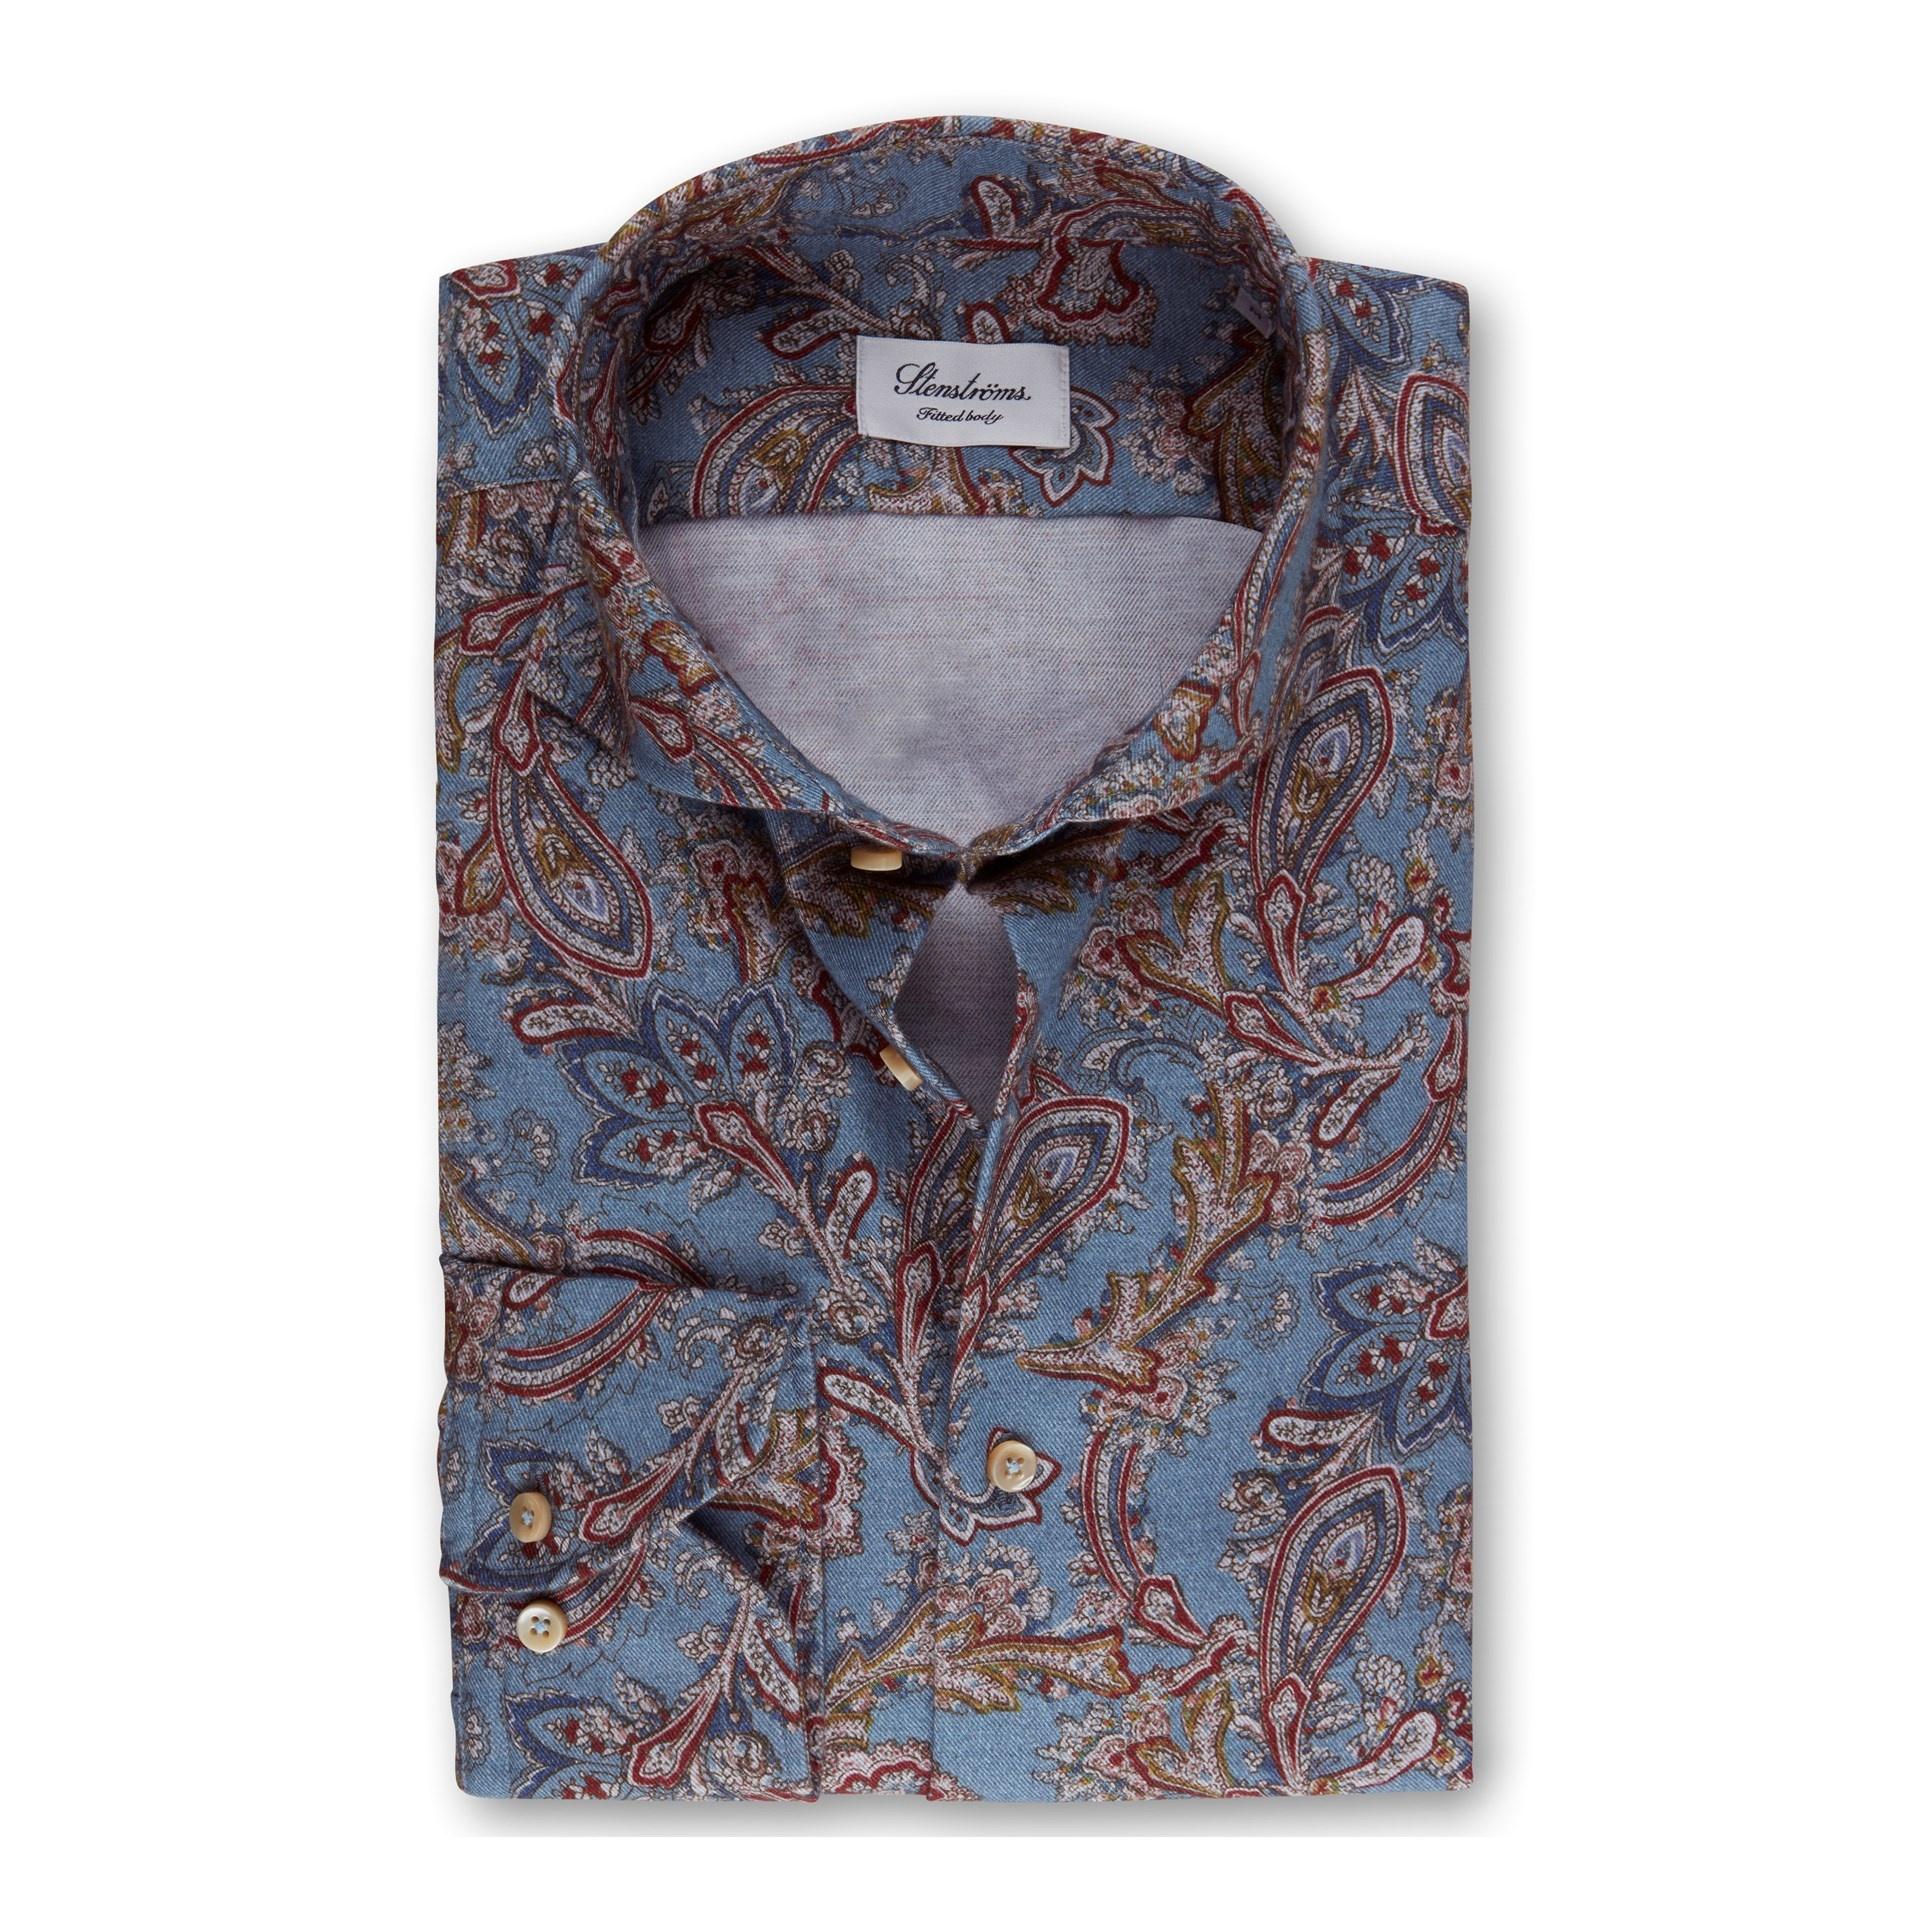 Stenstroms Soft Cotton Casual Paisley Shirt